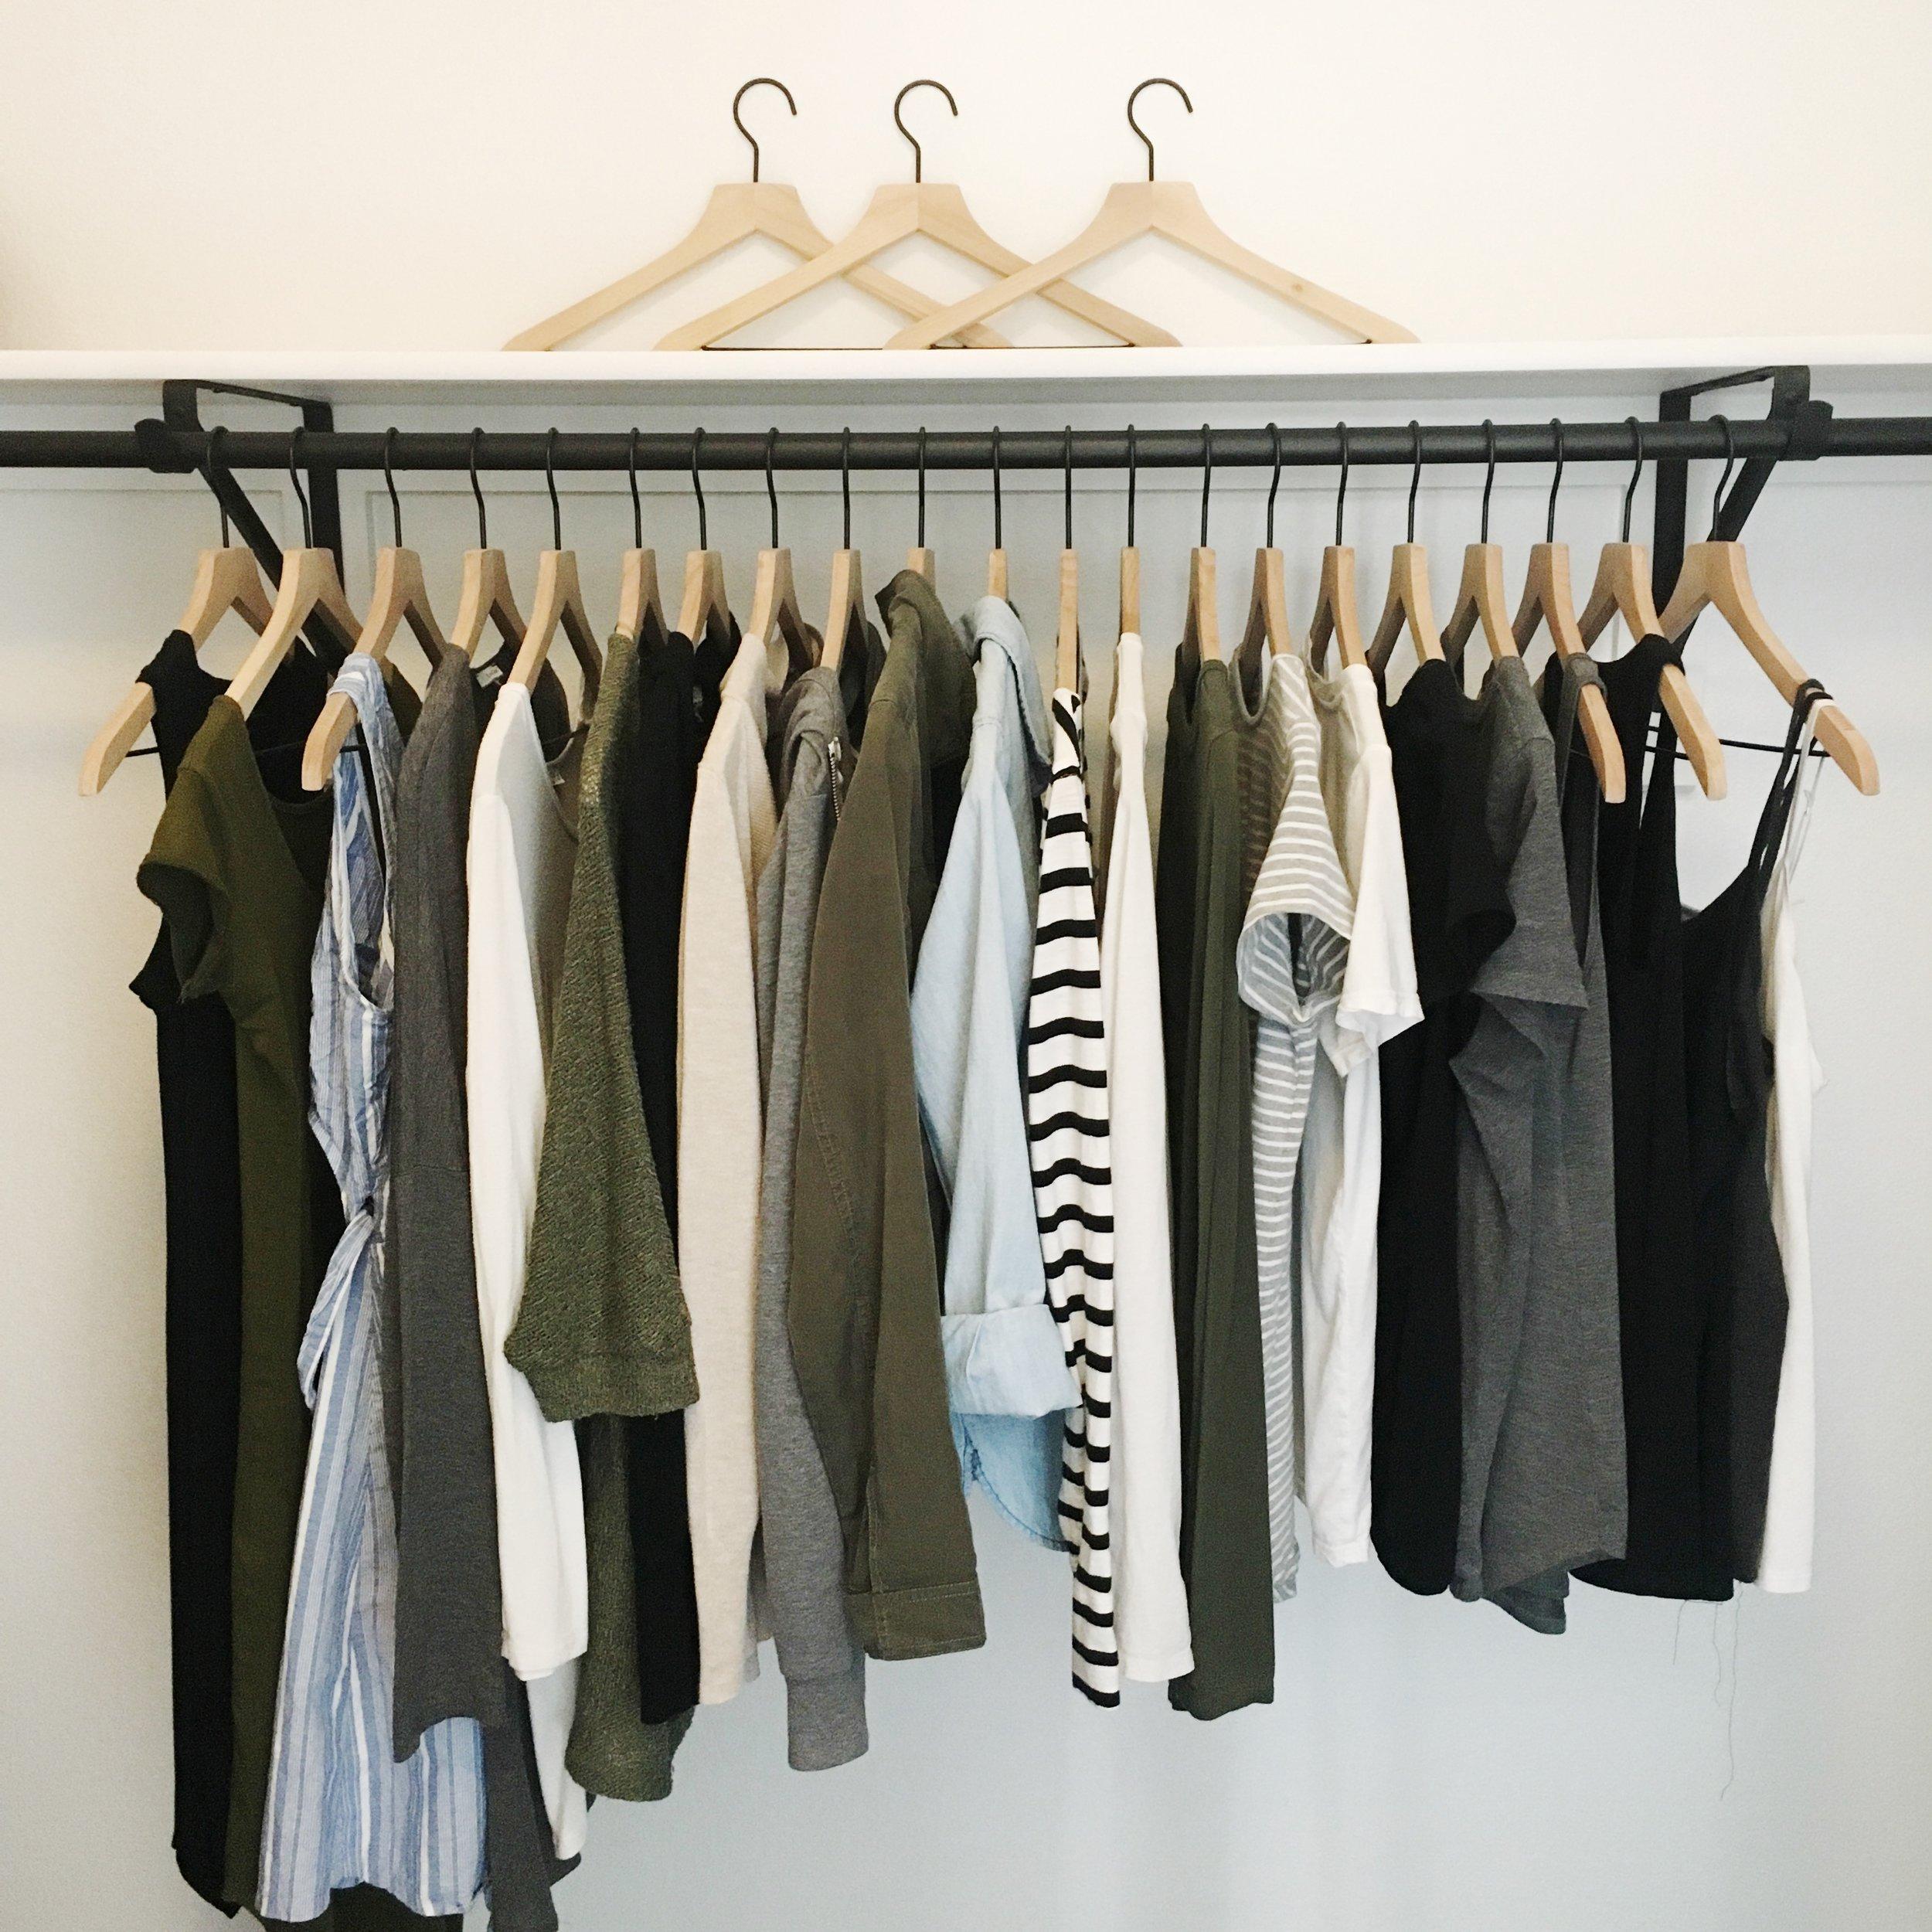 Capsule Wardrobe clothing in organized closet that sparks joy